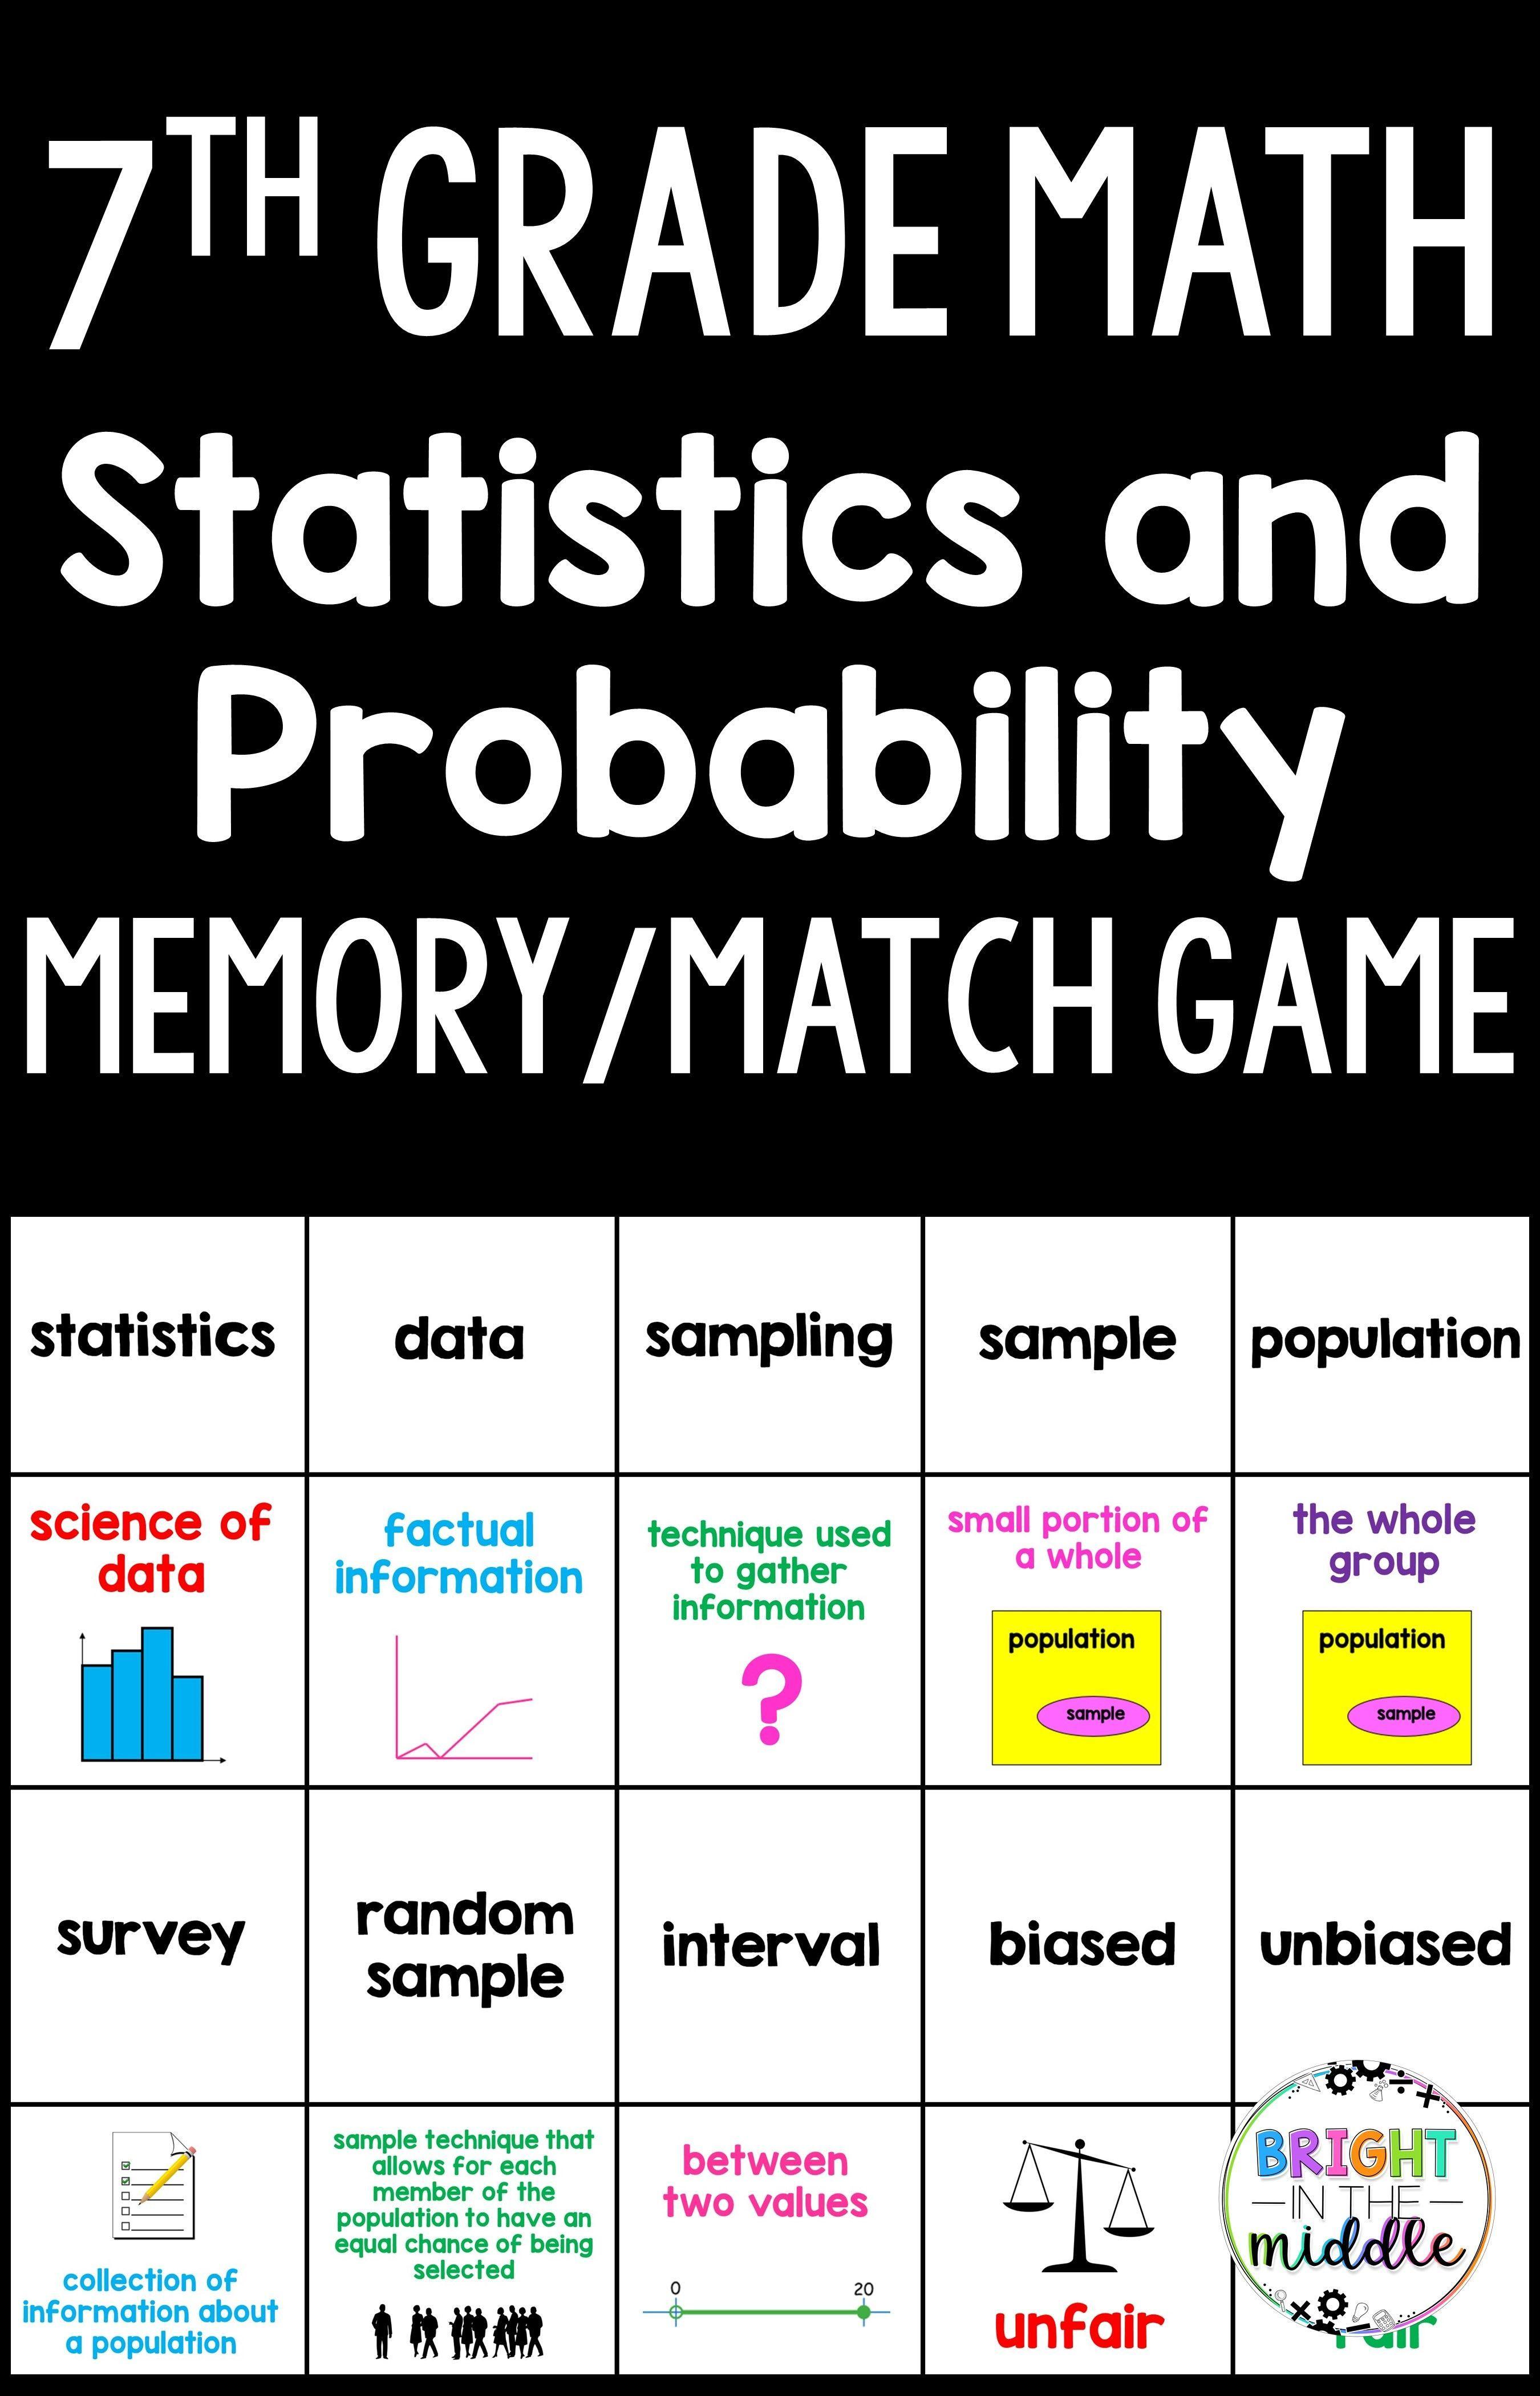 7th Grade Math Memory Game